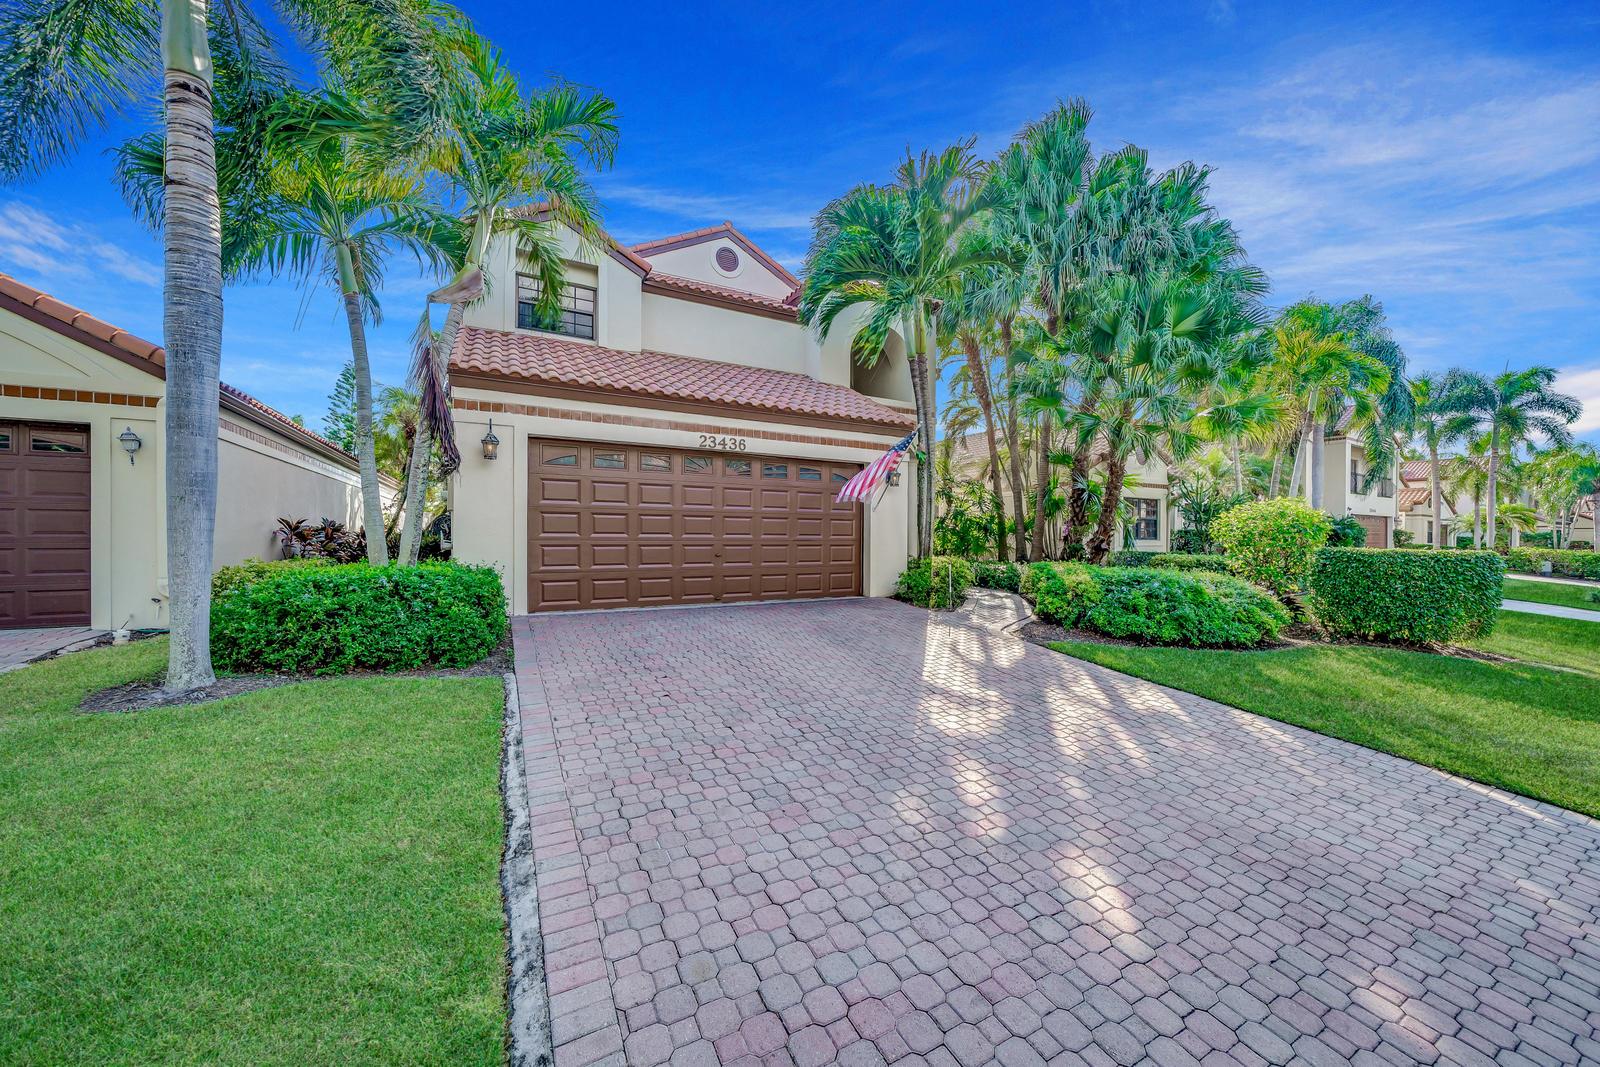 23436 Mirabella Circle Boca Raton, FL 33433